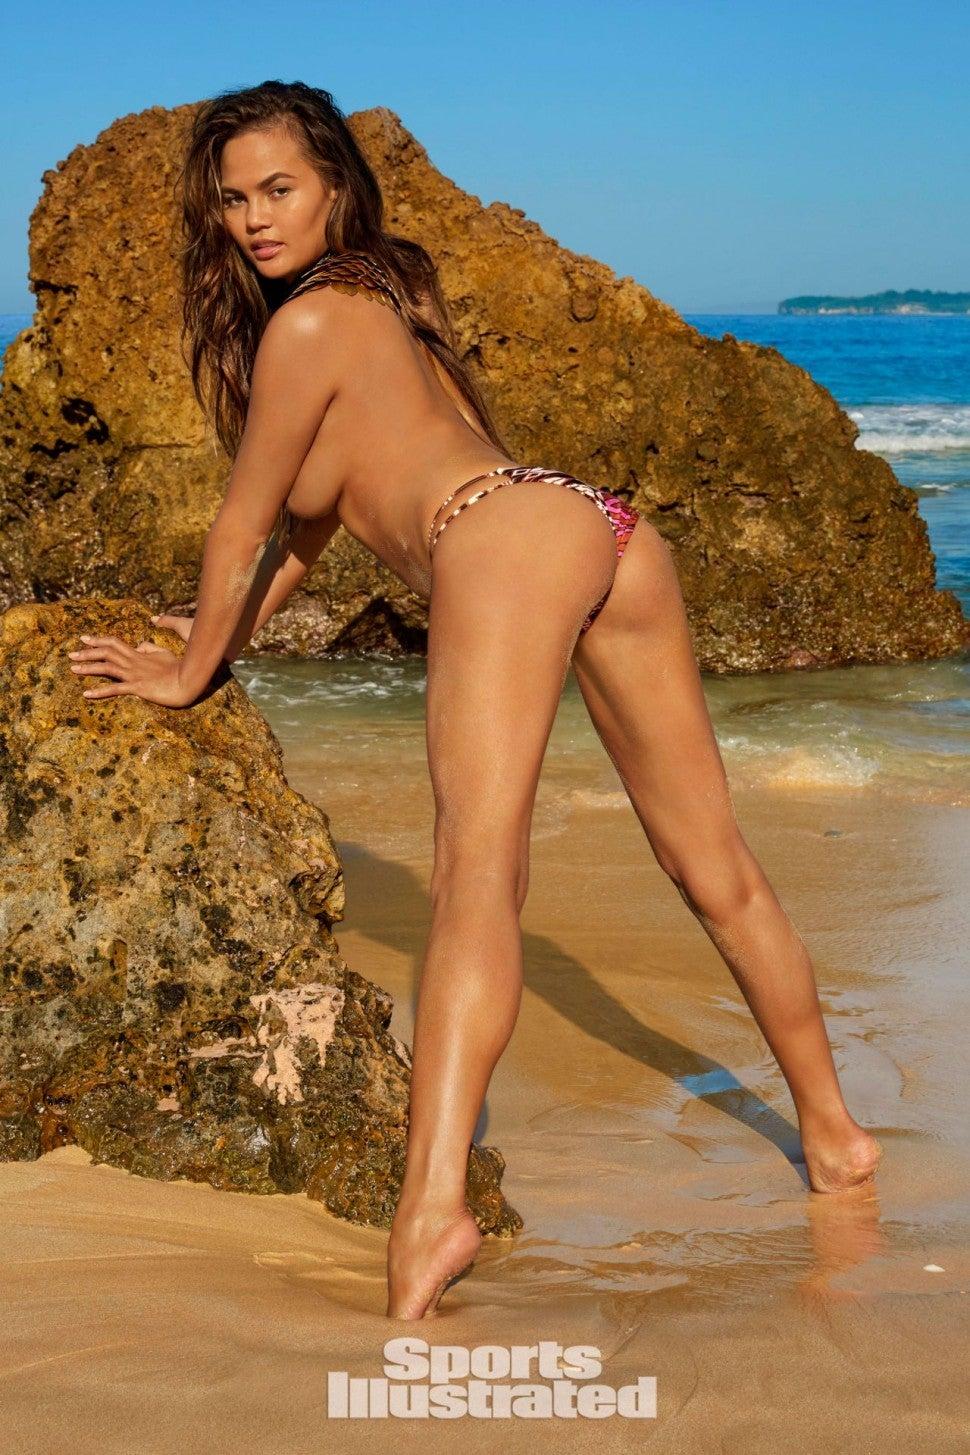 chrissy teigen sports illustrated swimsuit